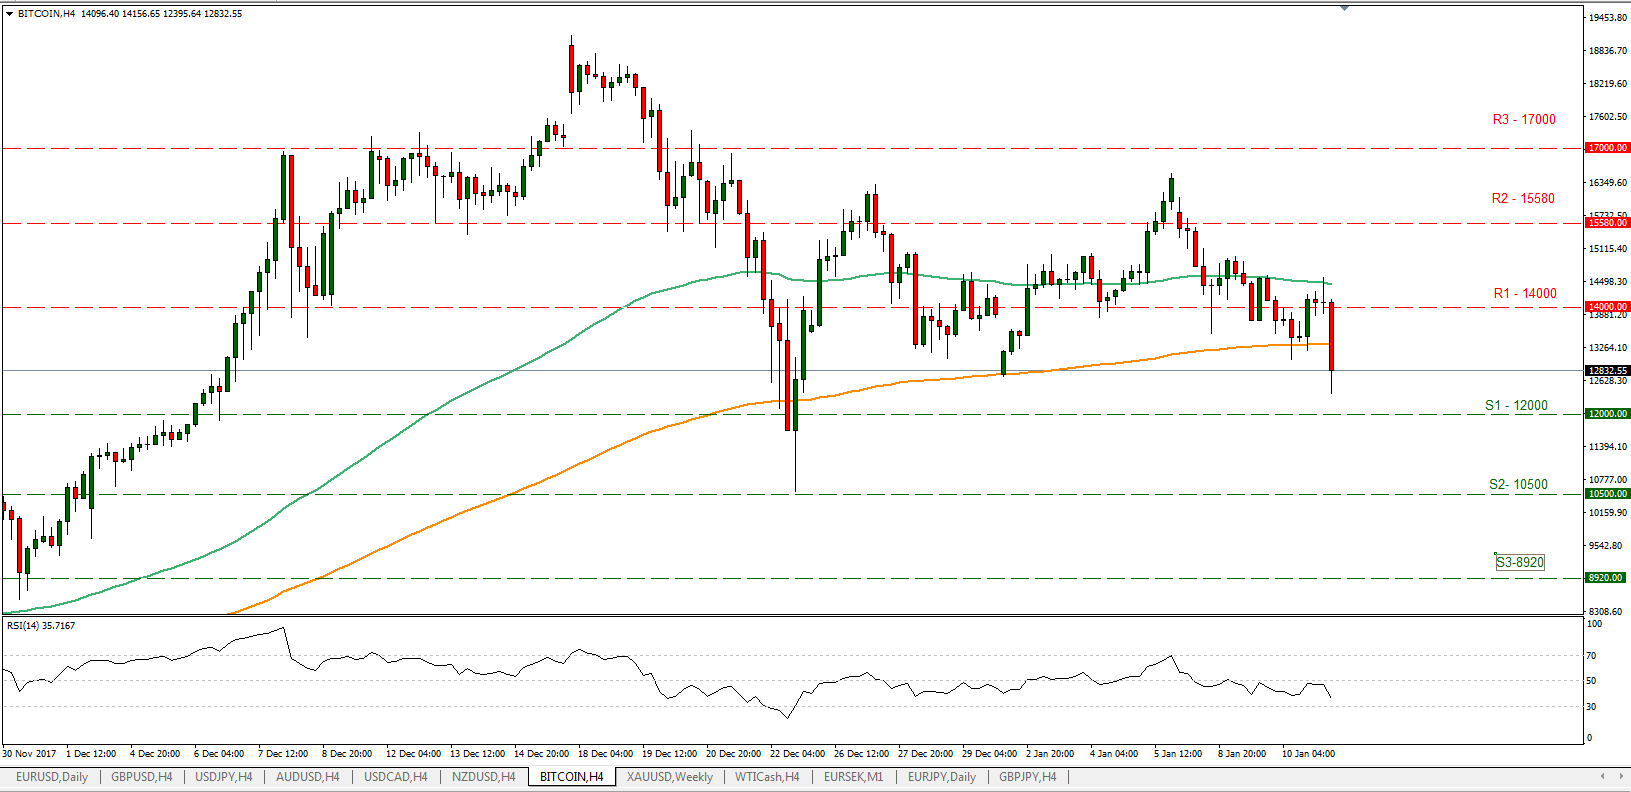 BTC/USD 11/01/2018 | Econ Alerts